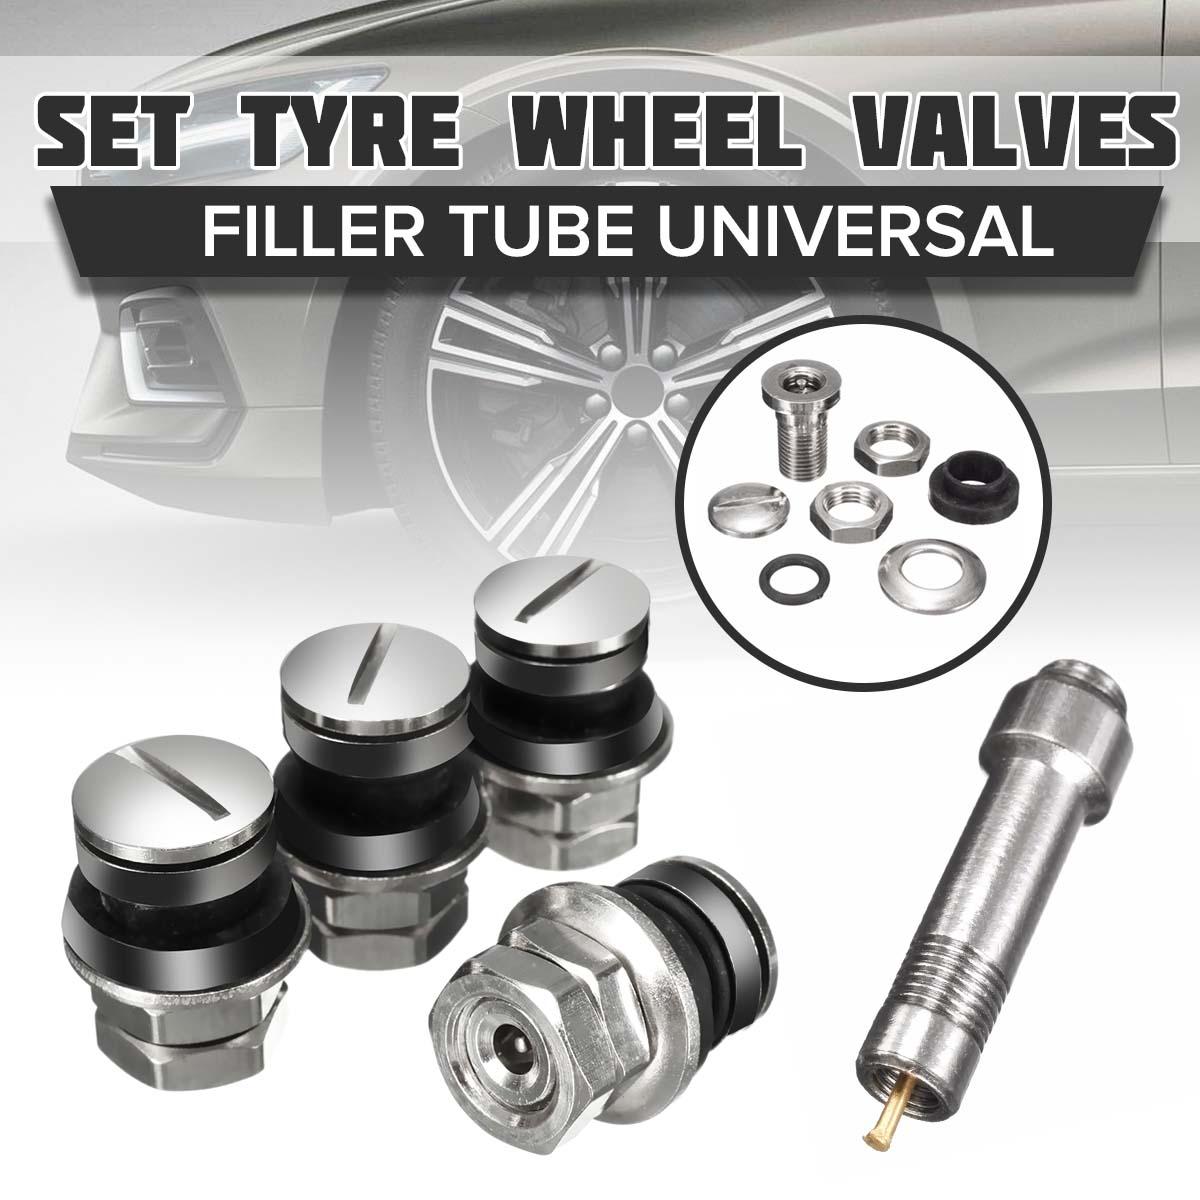 4 Pcs/Set Car Wheel Tire Tyre Valve Stems Tube Cap Durable Chrome Stealth Flush Mount